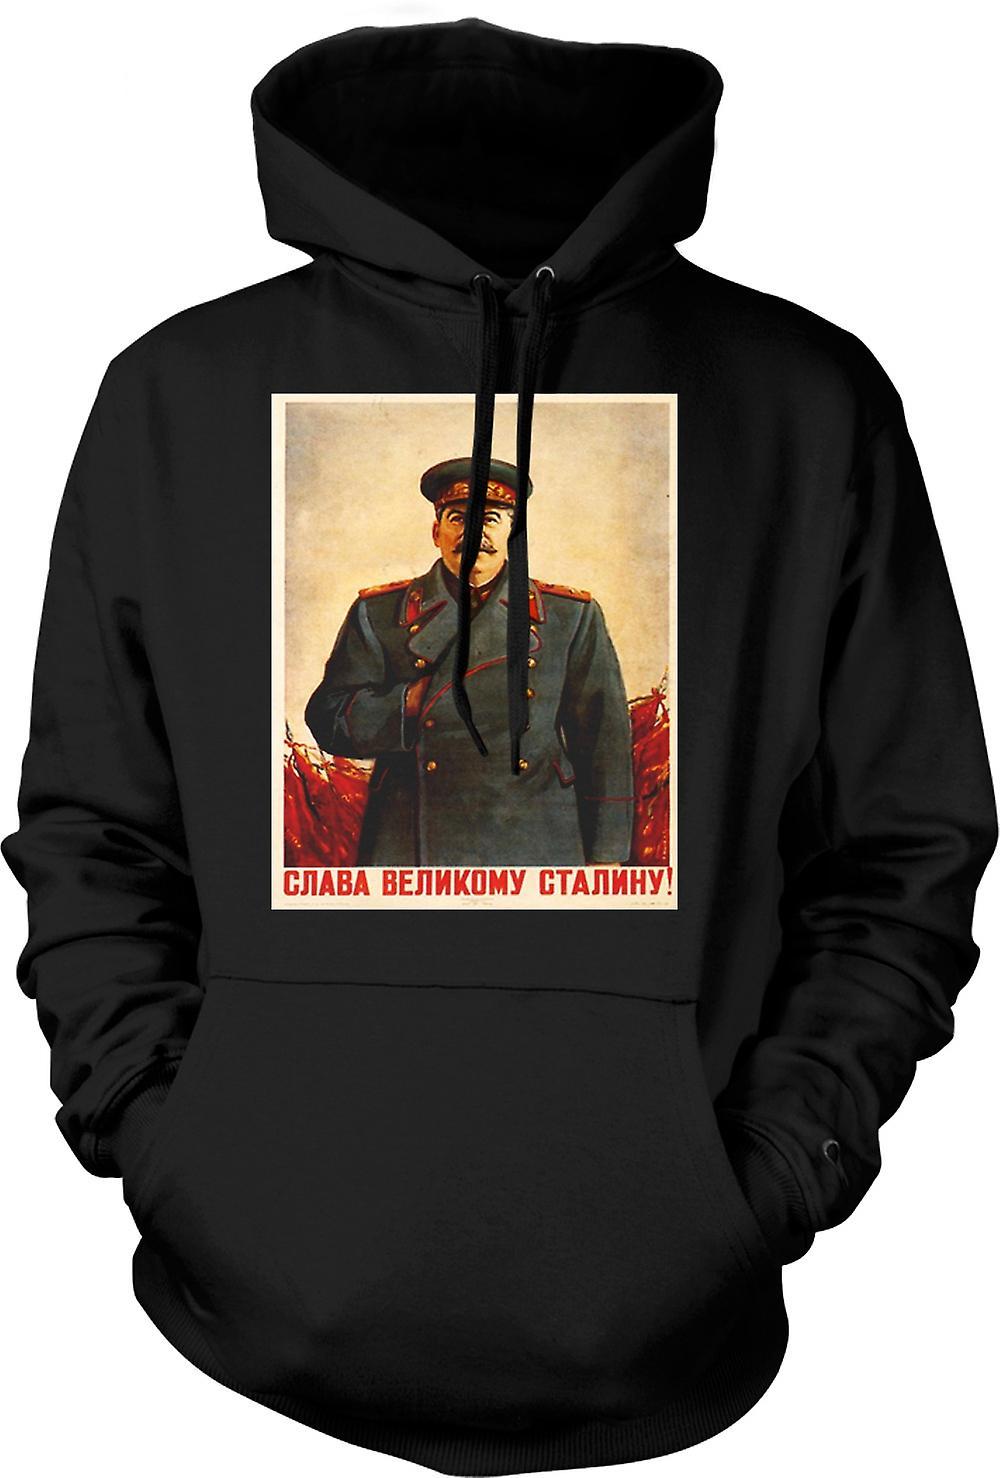 Mens Hoodie - rysk propaganda affisch - Stalin